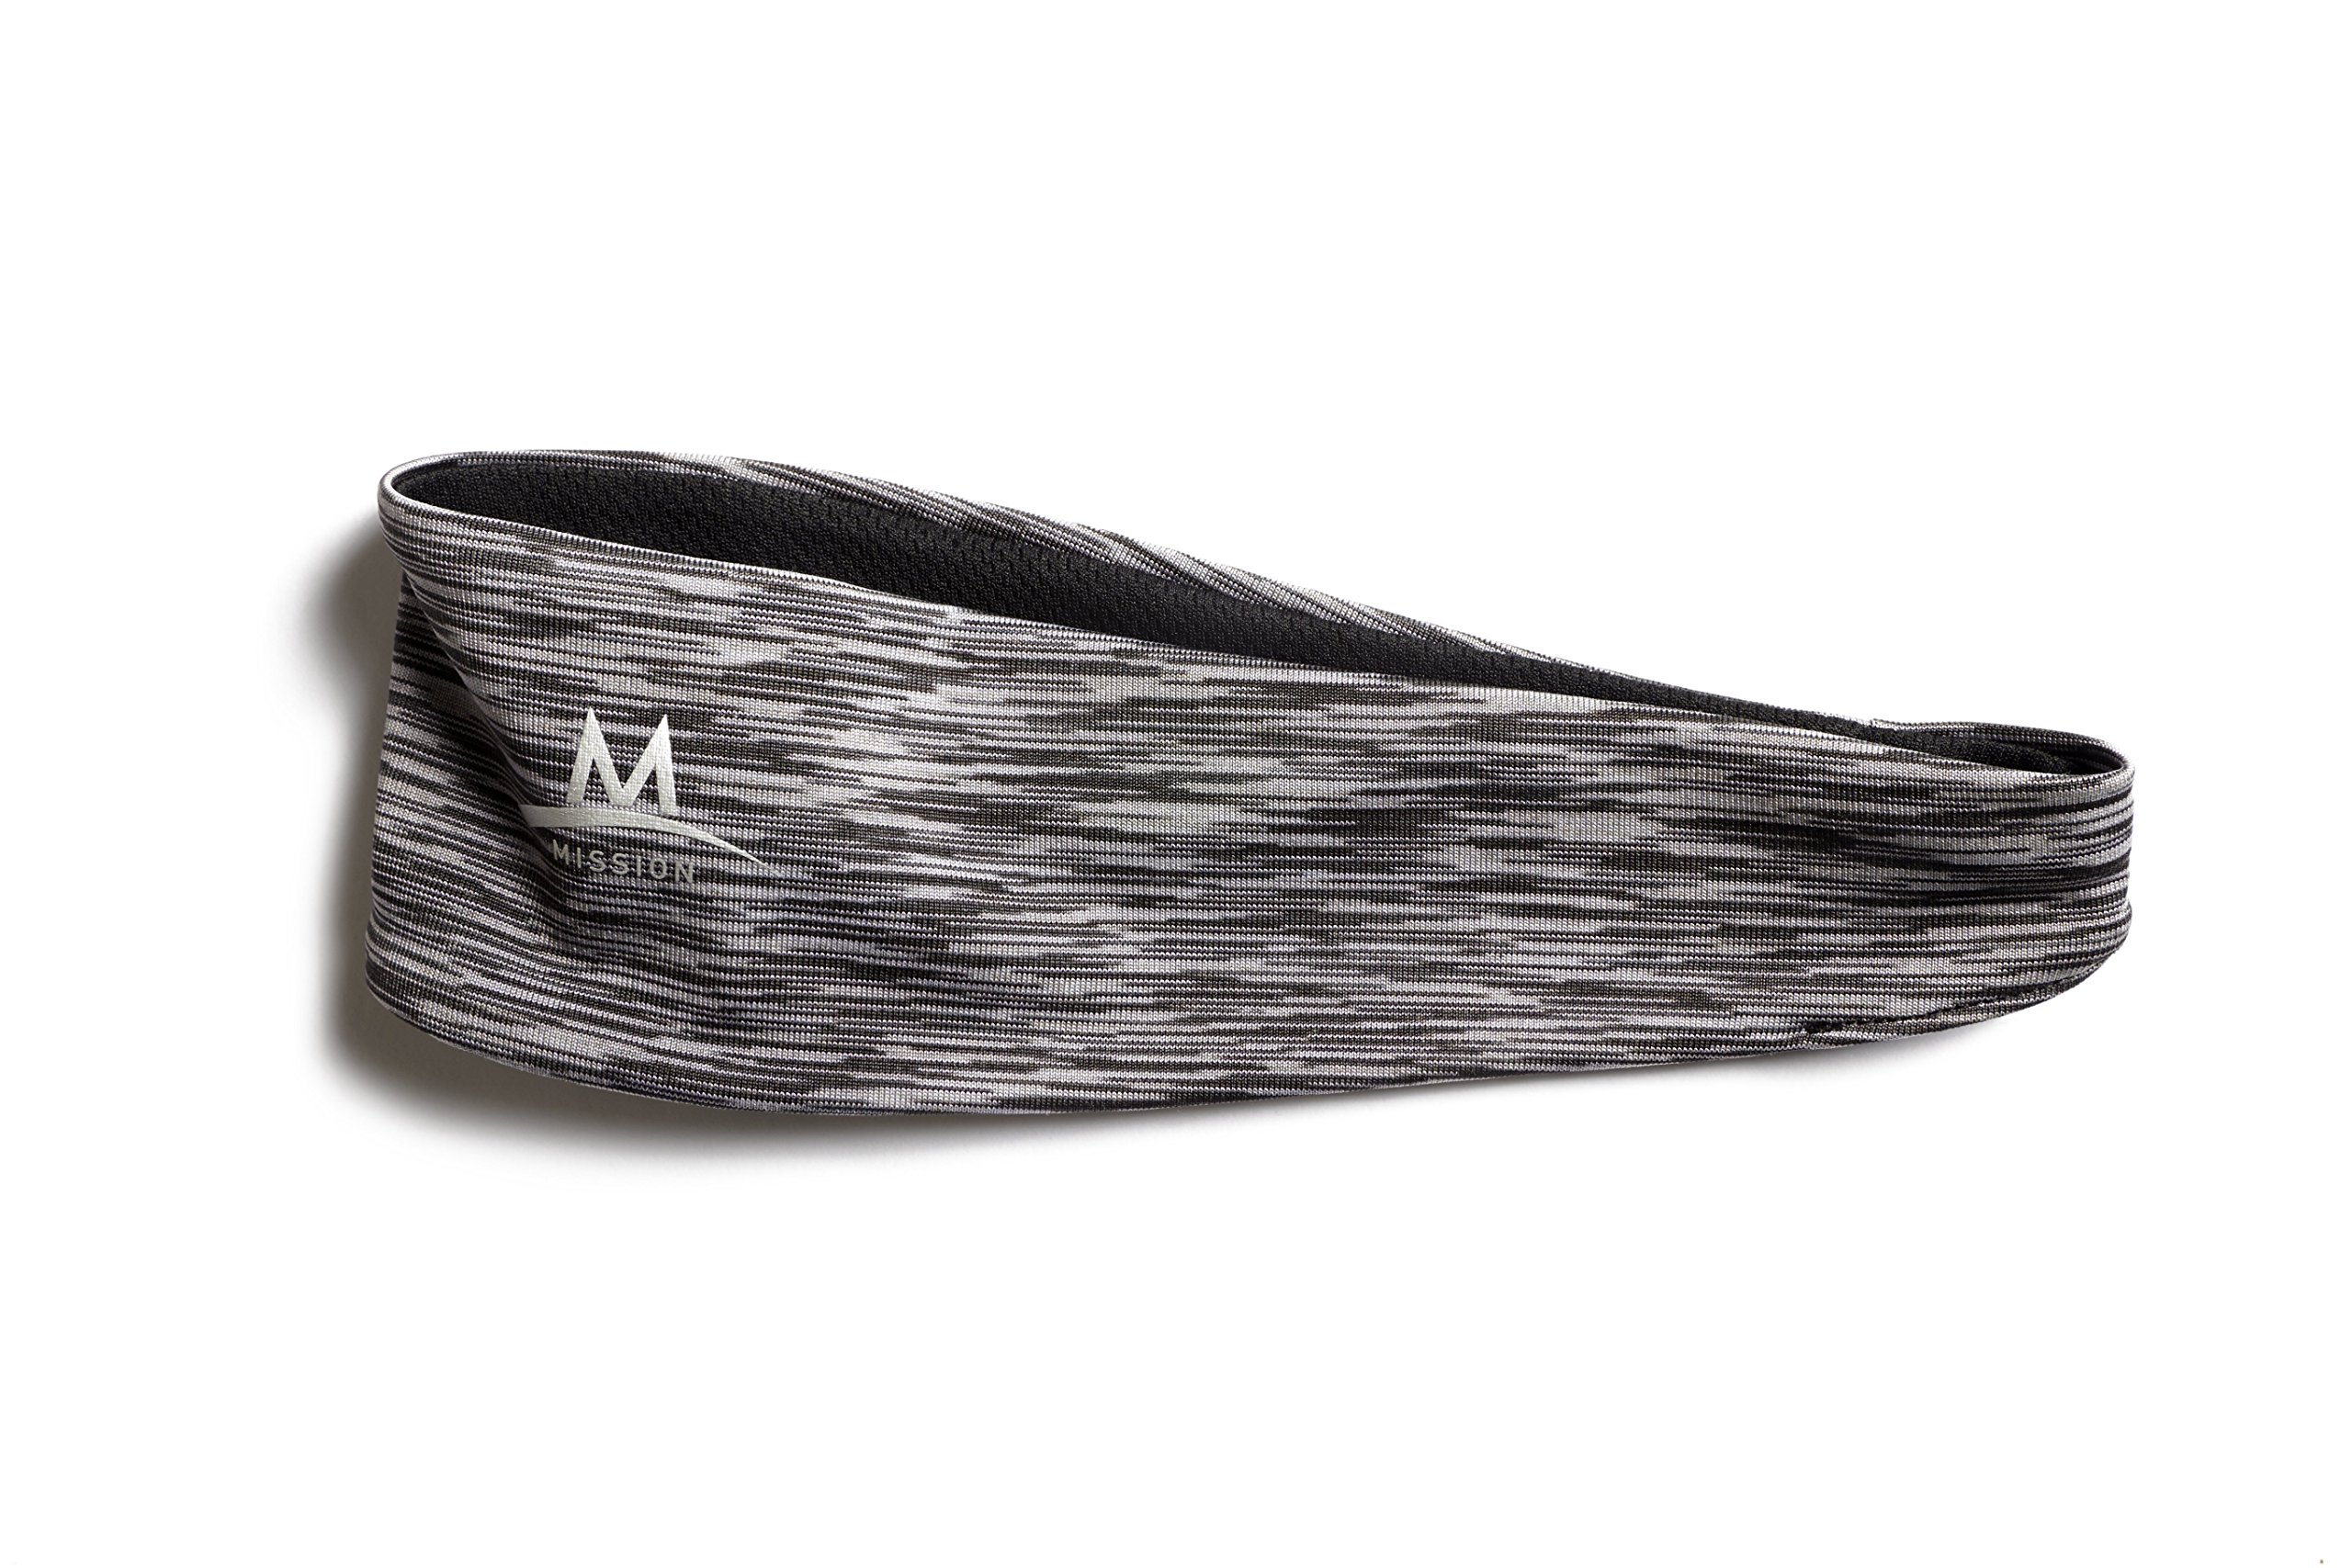 Mission Enduracool Lockdown Cooling Headband, Charcoal Space Dye